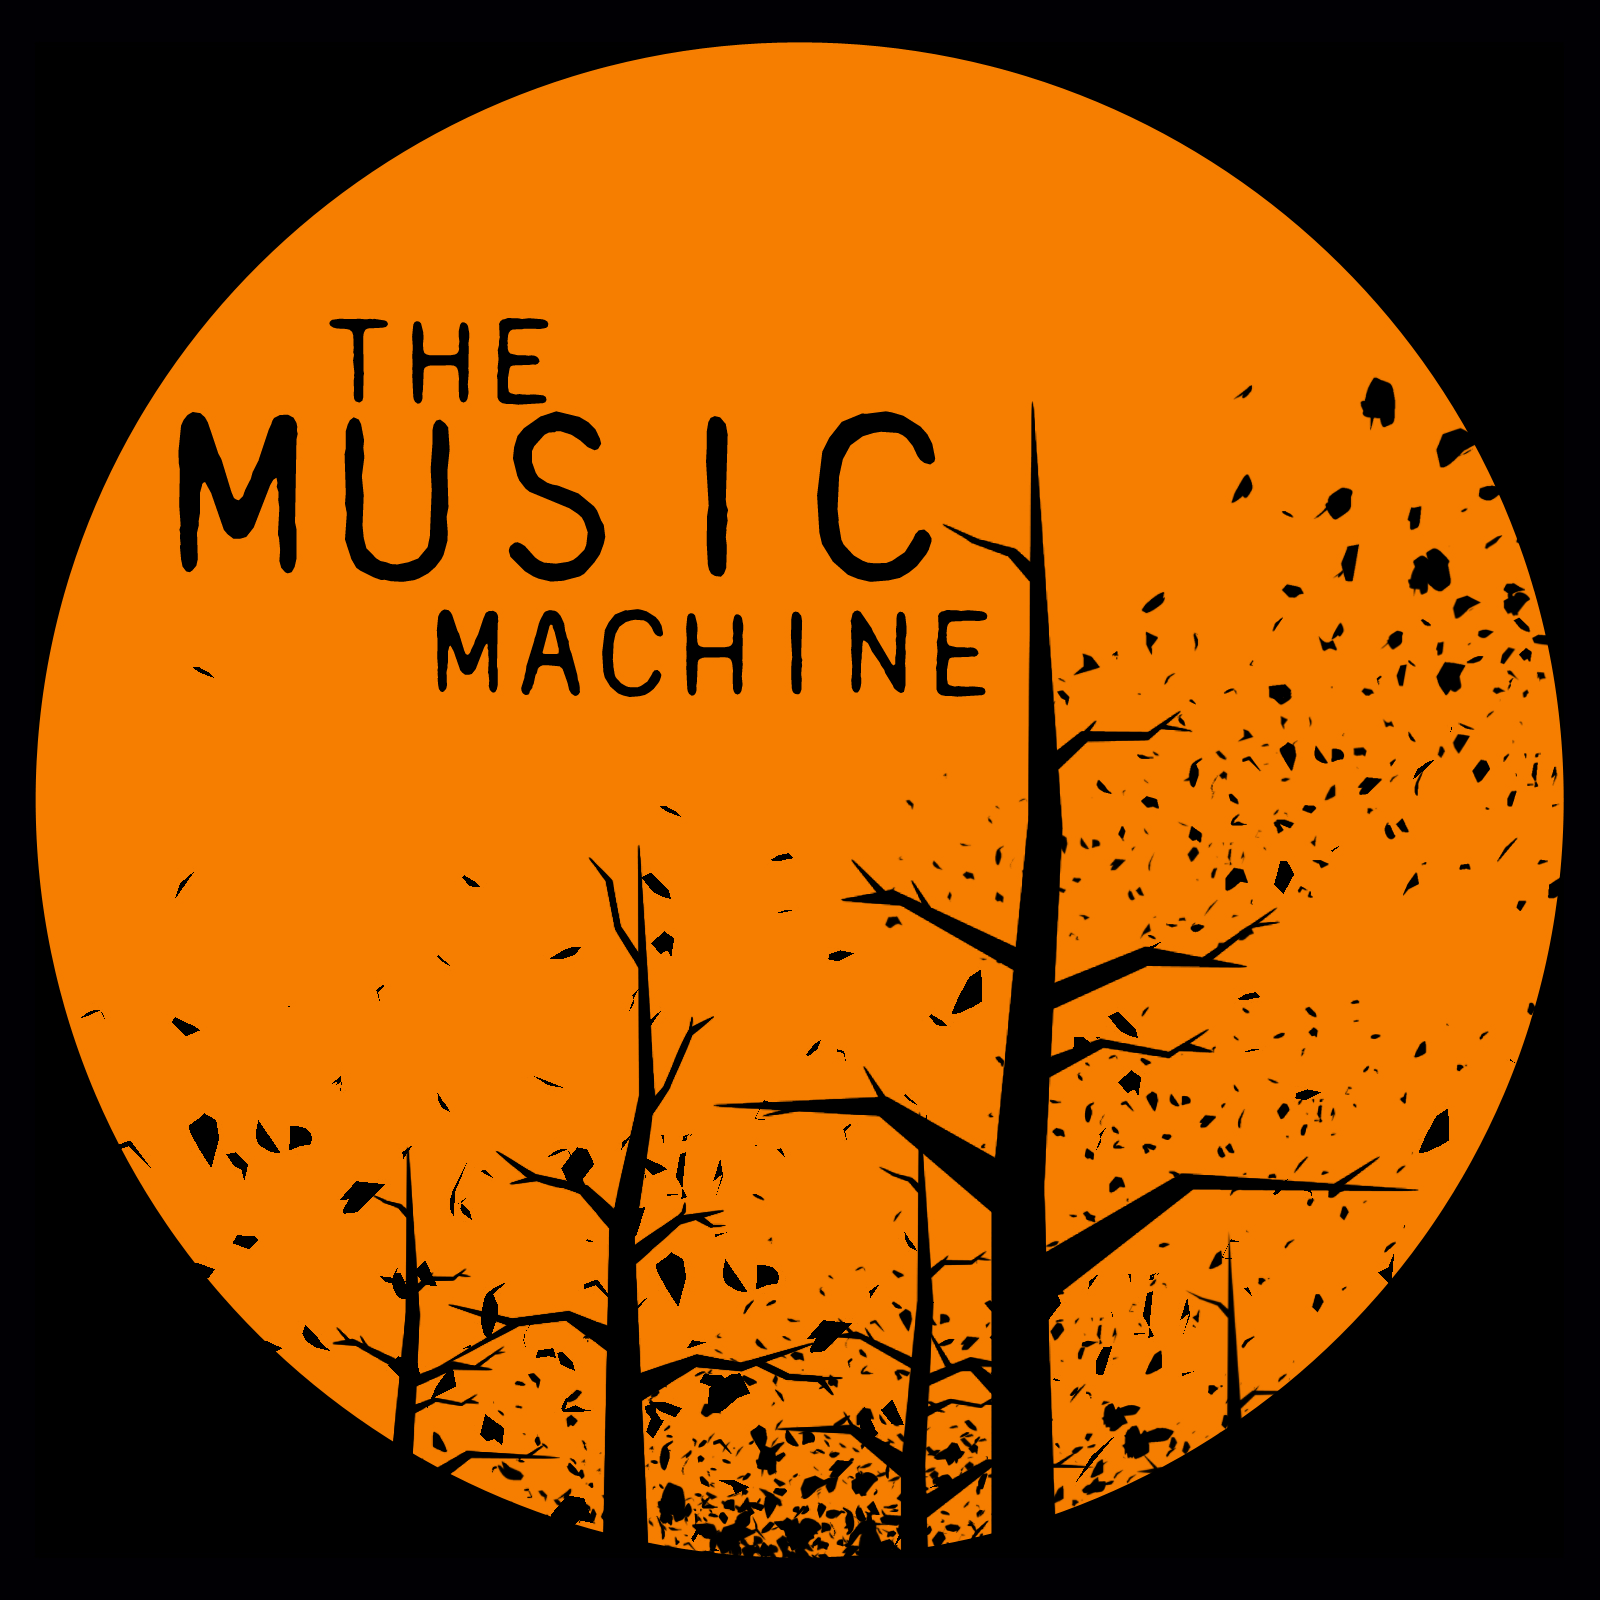 The machine ost